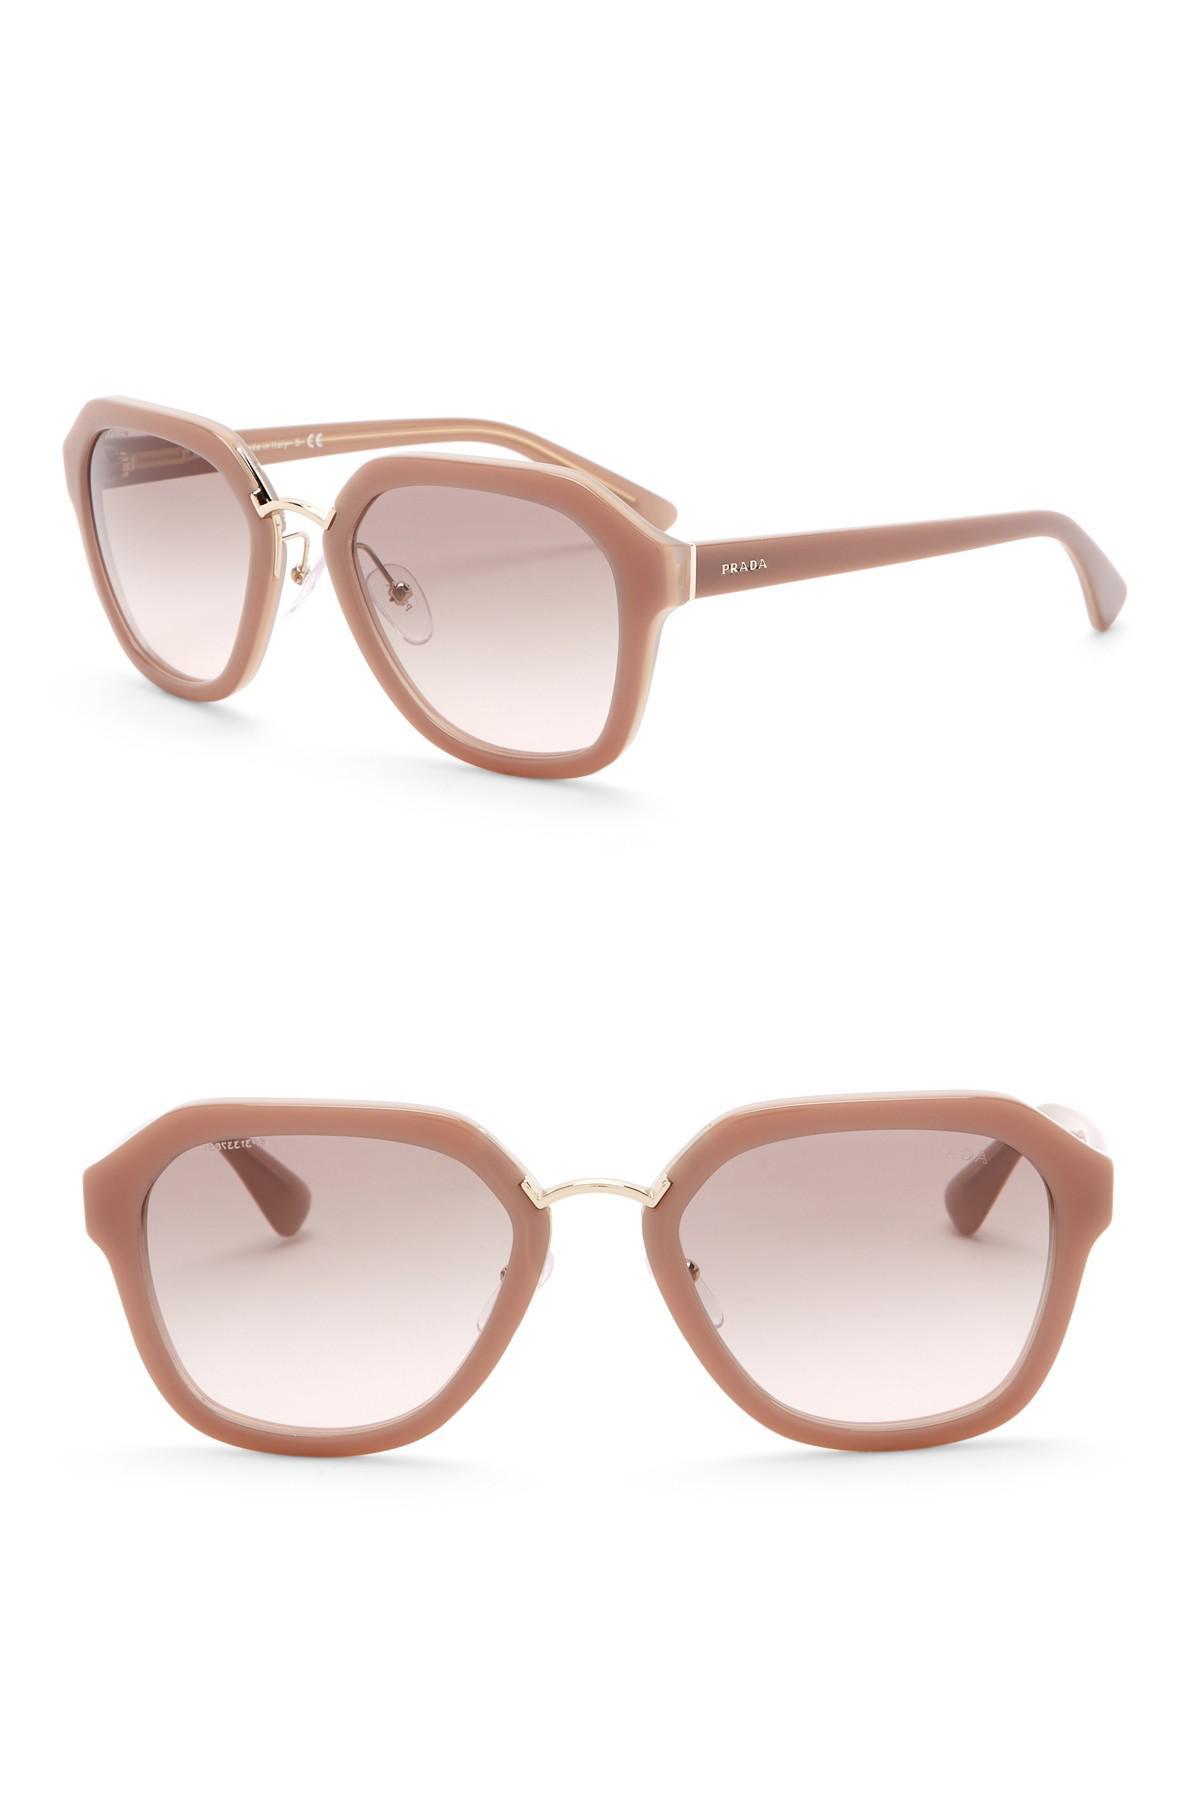 fb4d3b570ae89 Prada 55mm Square Sunglasses in Pink - Lyst